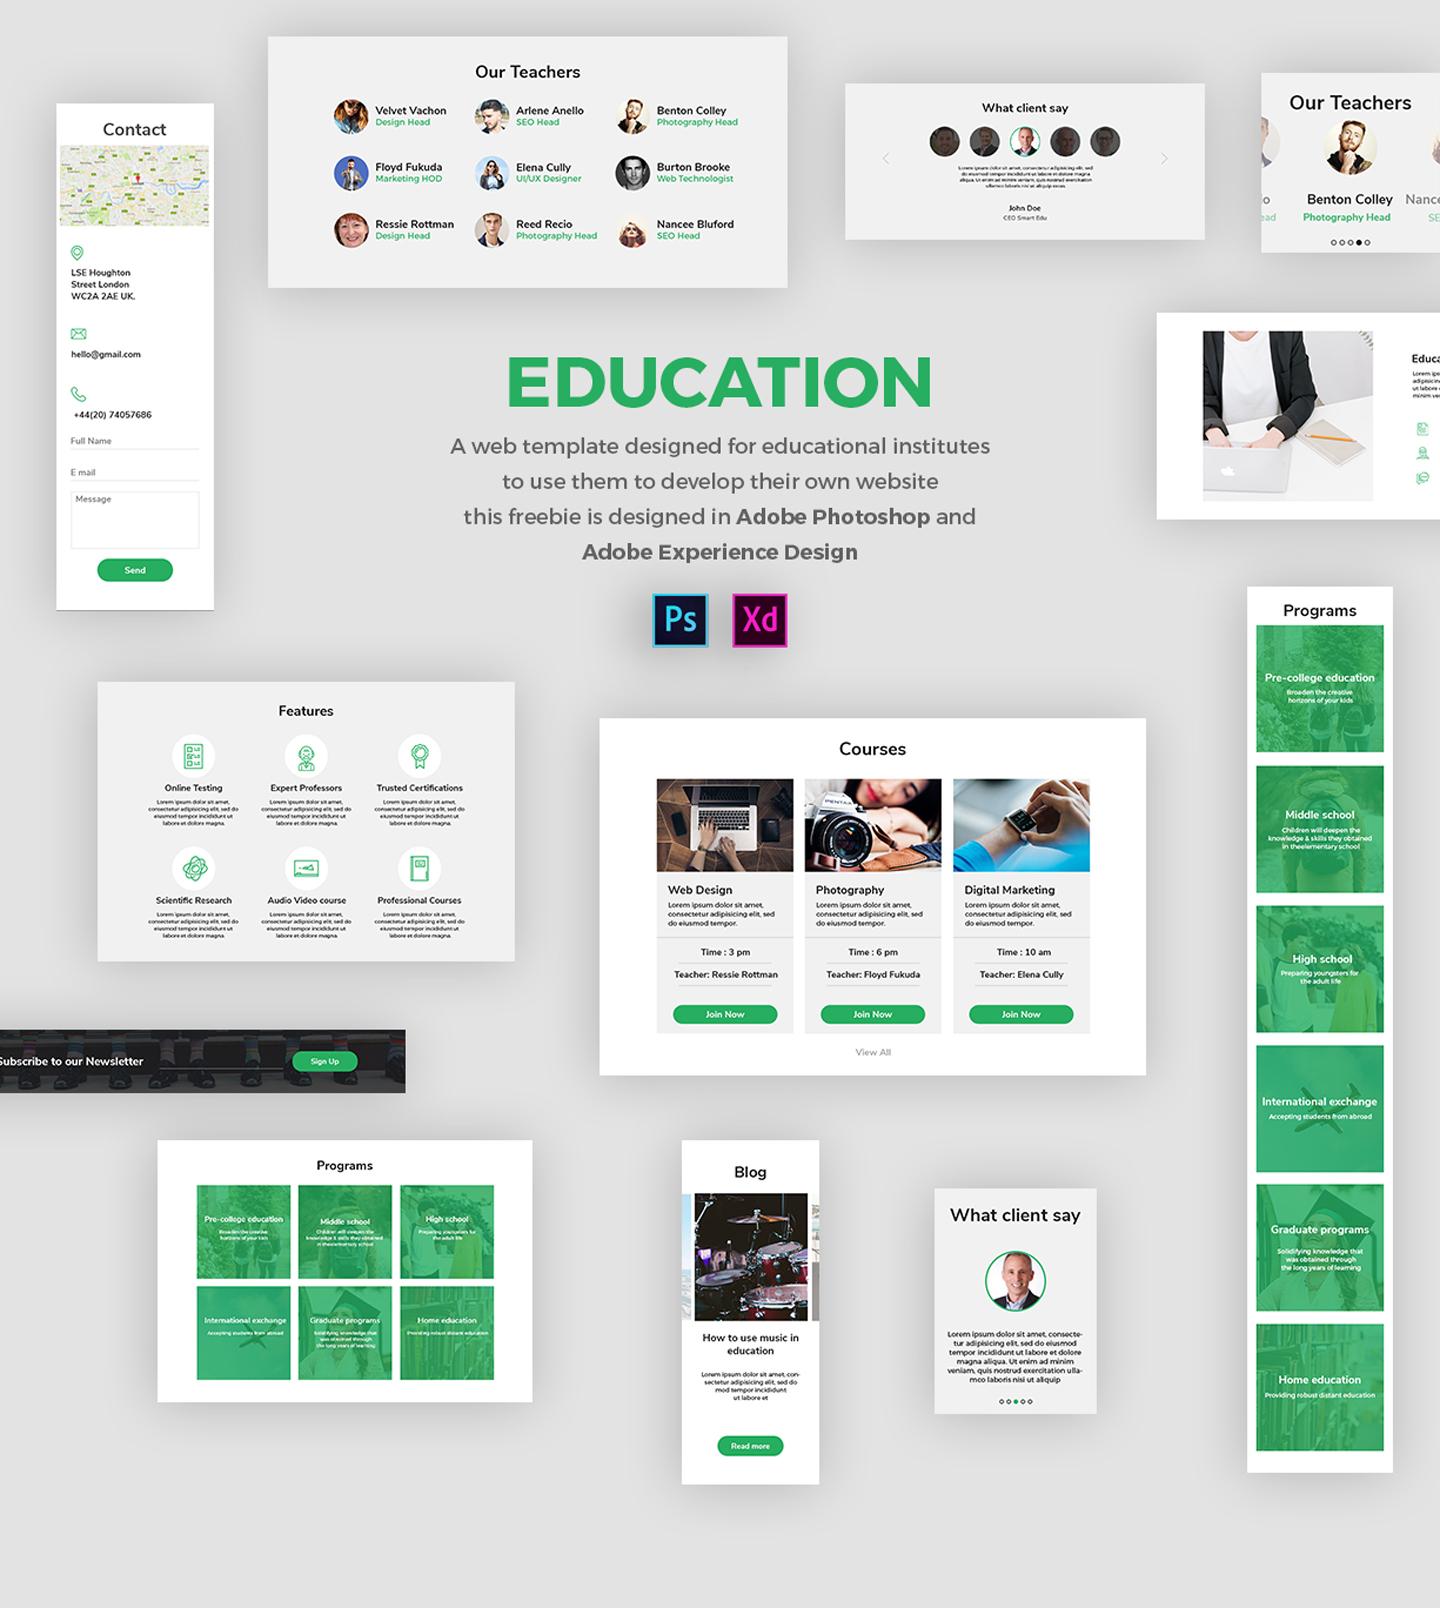 Adobe XD Freebie-EDUCATION on Behance